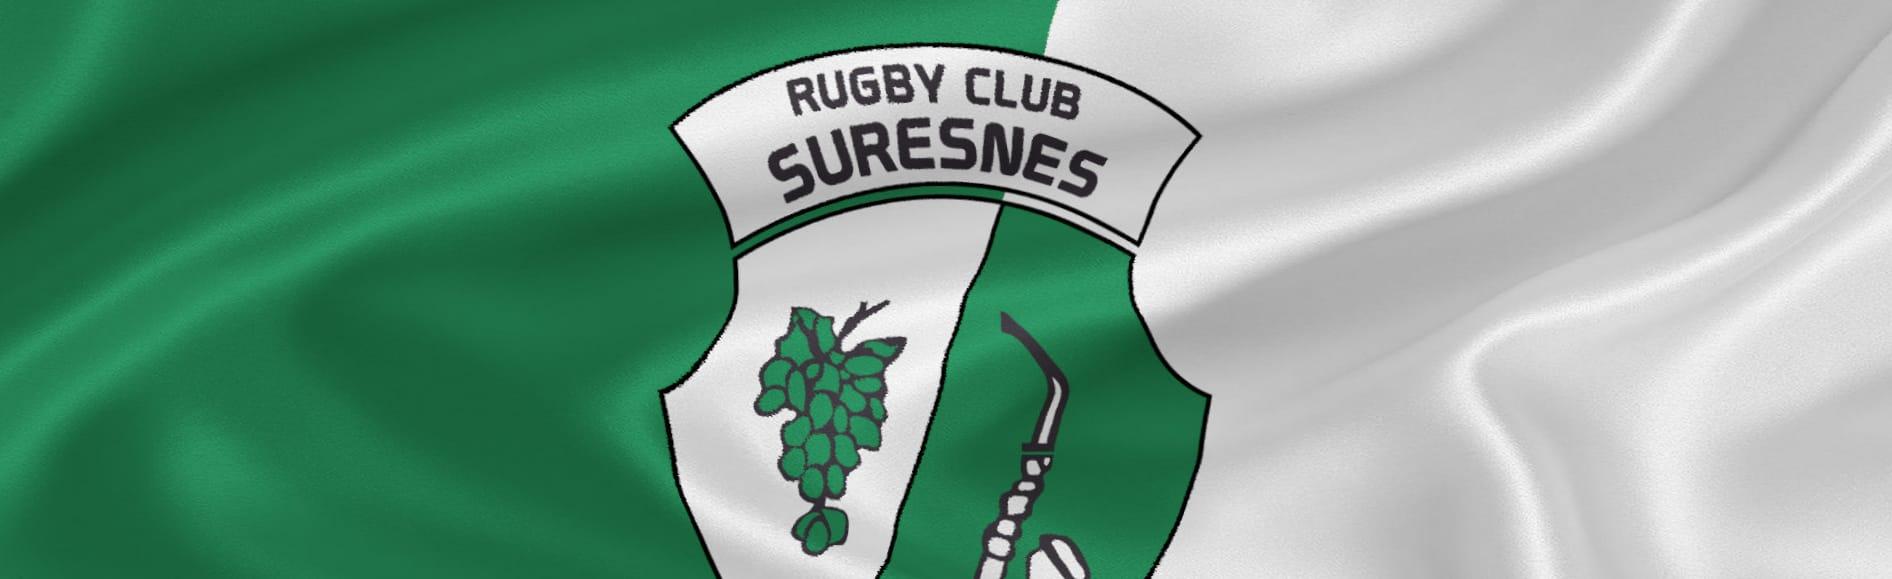 Rugby Club de Suresnes - Hauts de Seine  U16 M - Elite Gaudermen